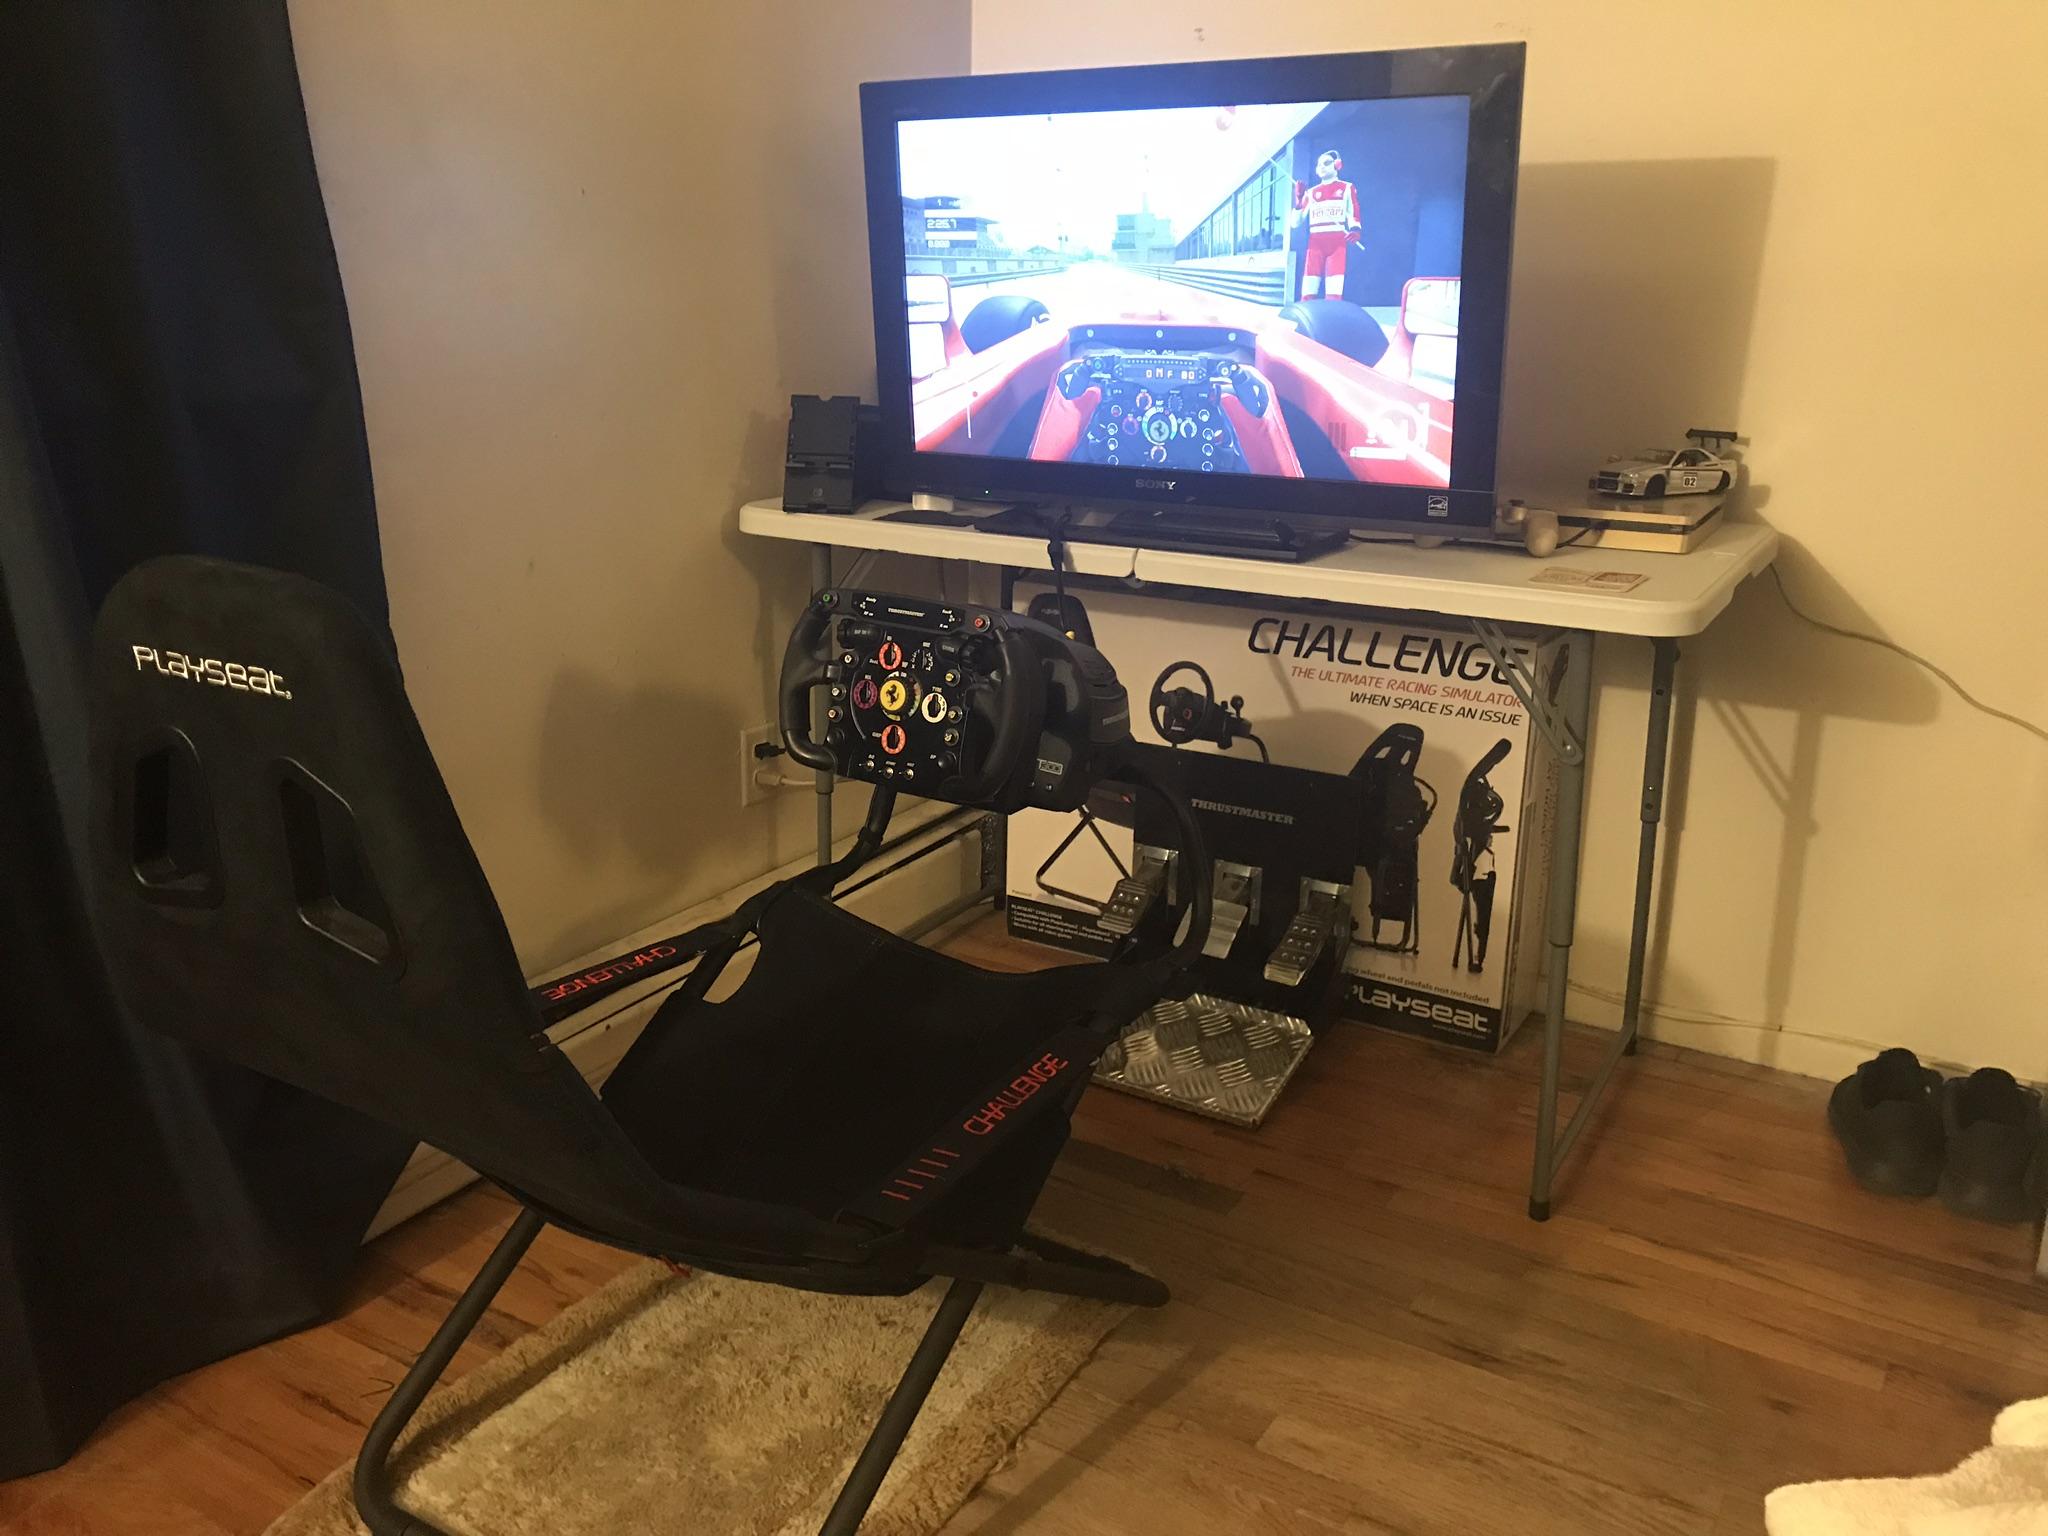 Playseat Challenge Durability/Life span - Racing Rig Reviews